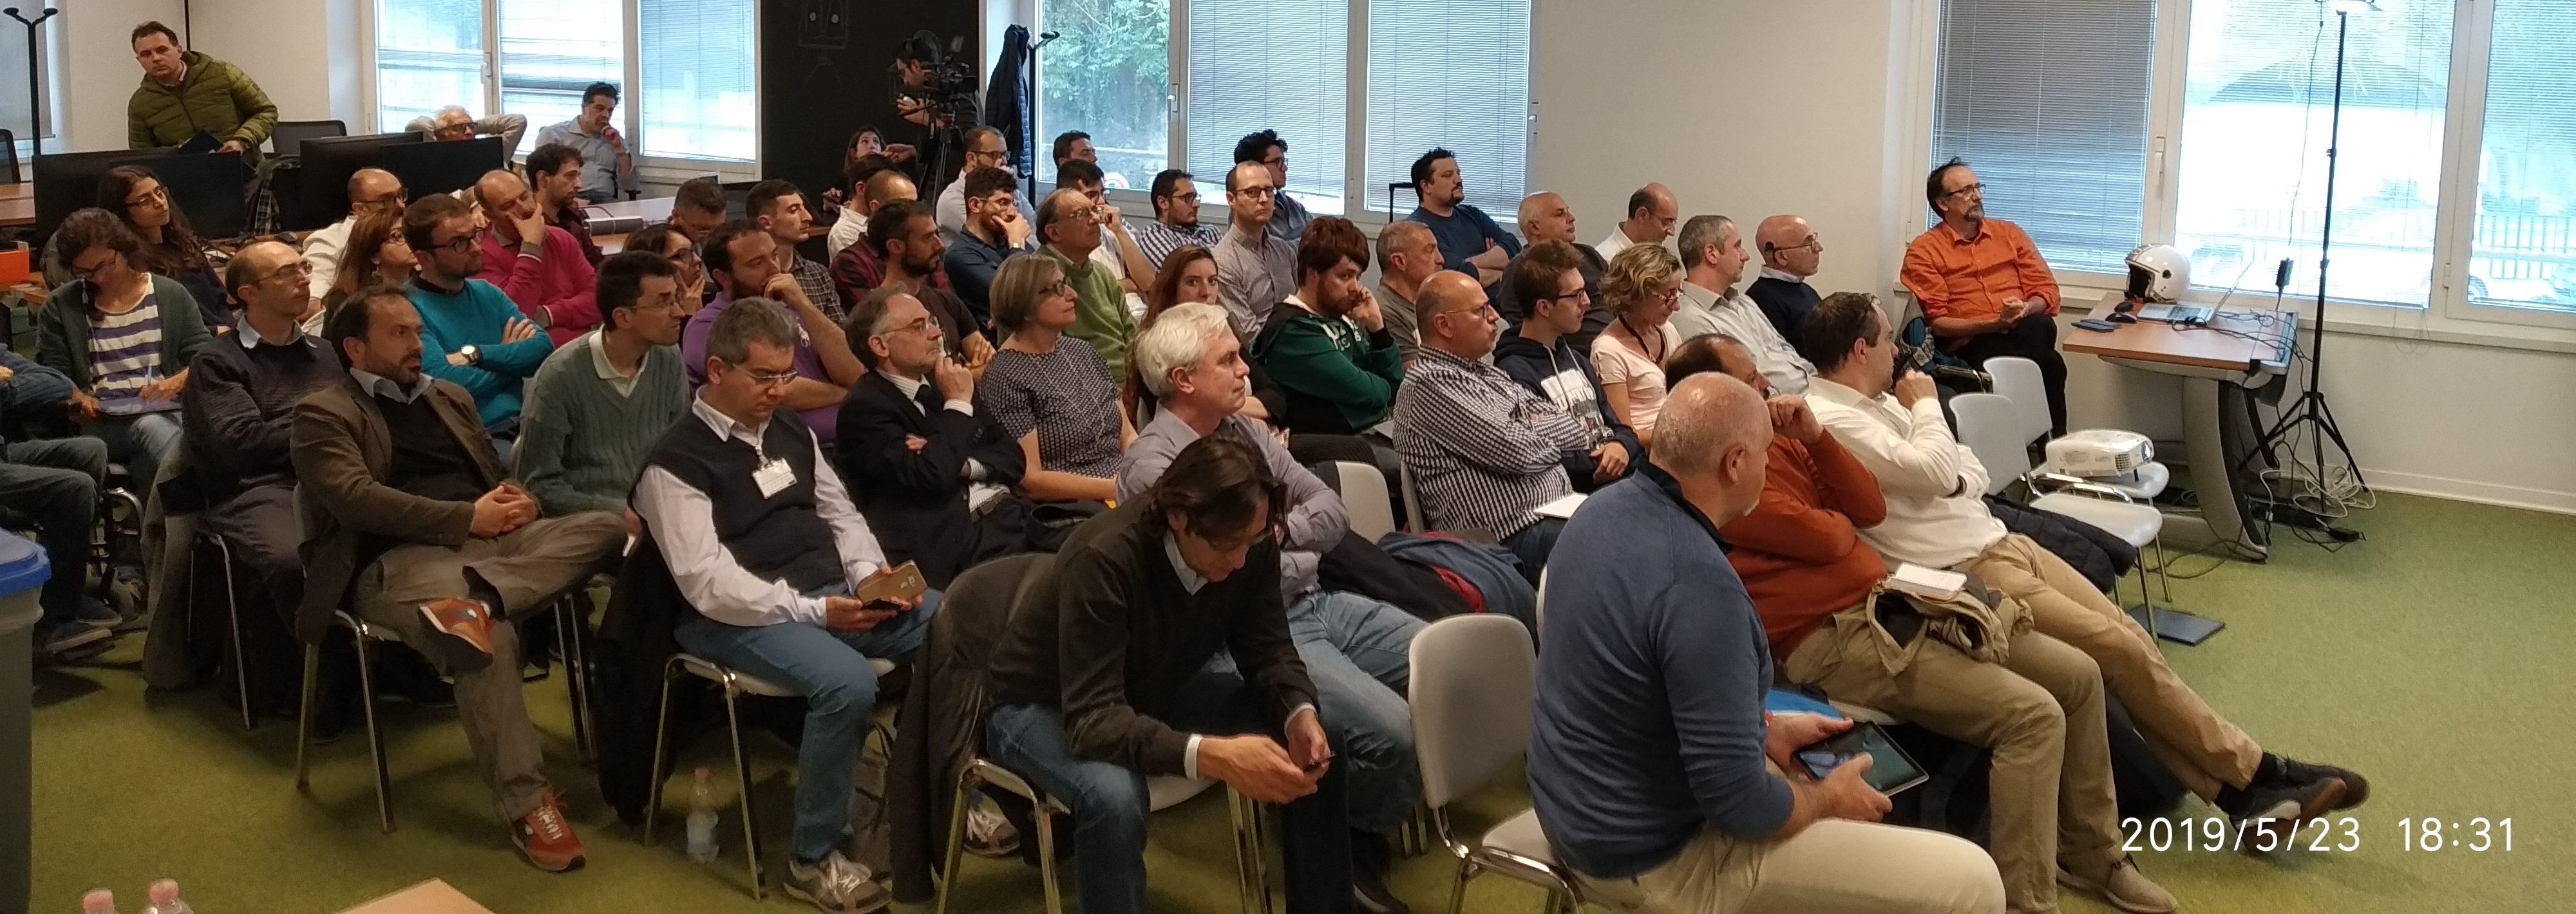 DataScienceSeed meetup 23 maggio 2019